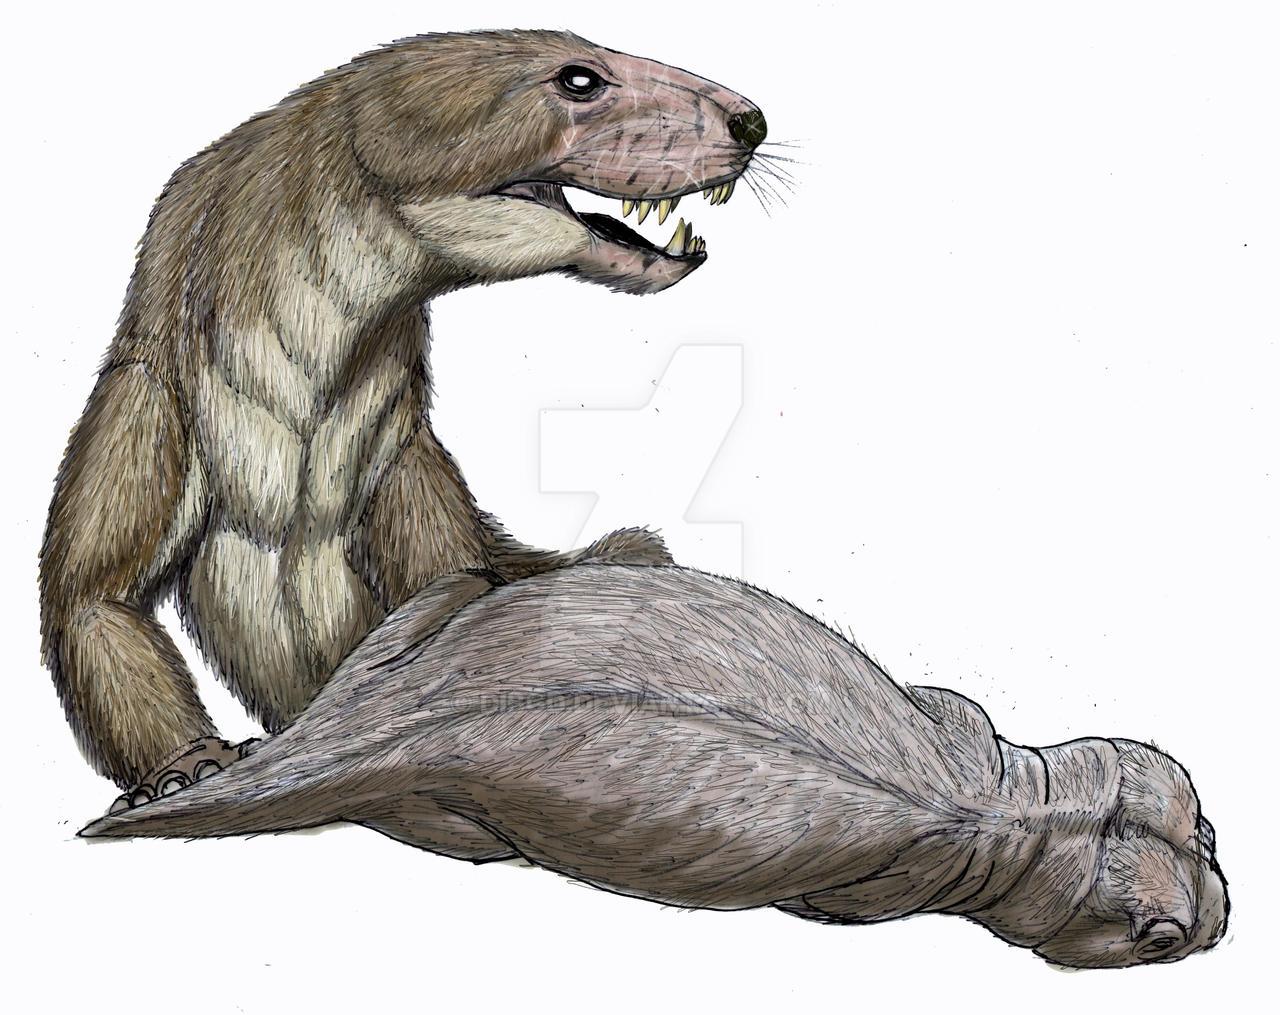 Megawhaitsia patrichiae